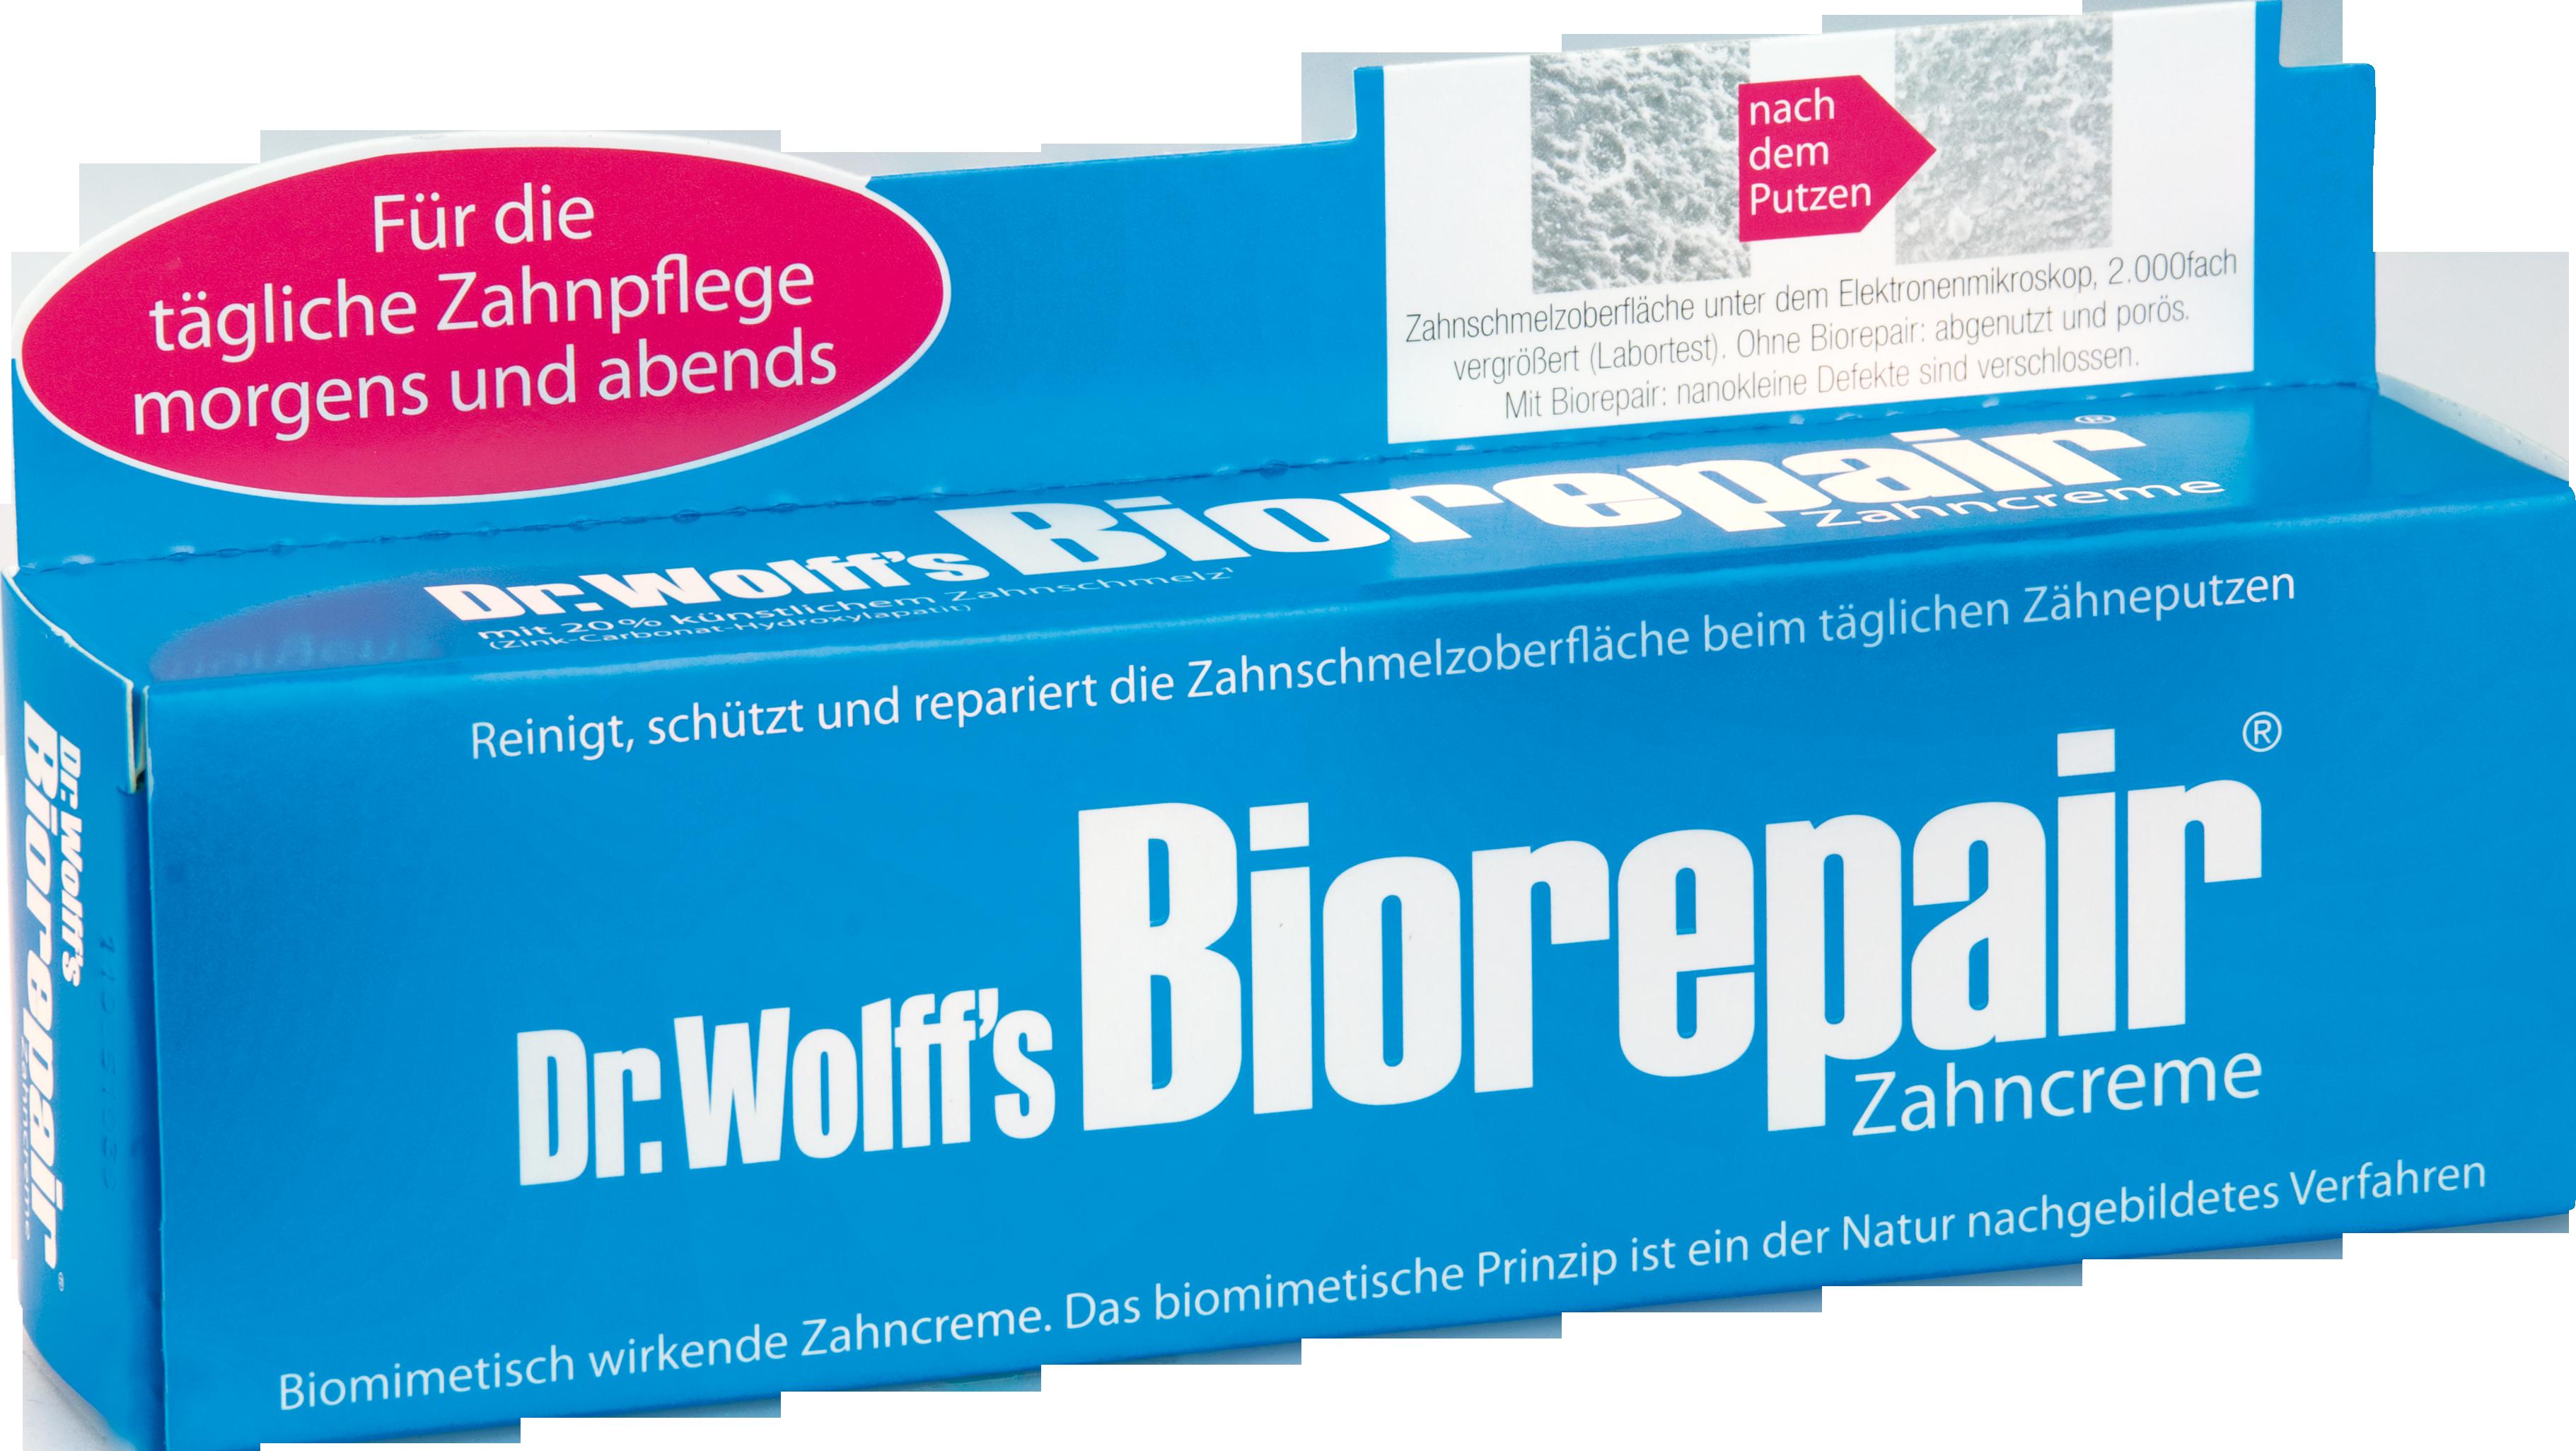 BioRepair Zahncreme